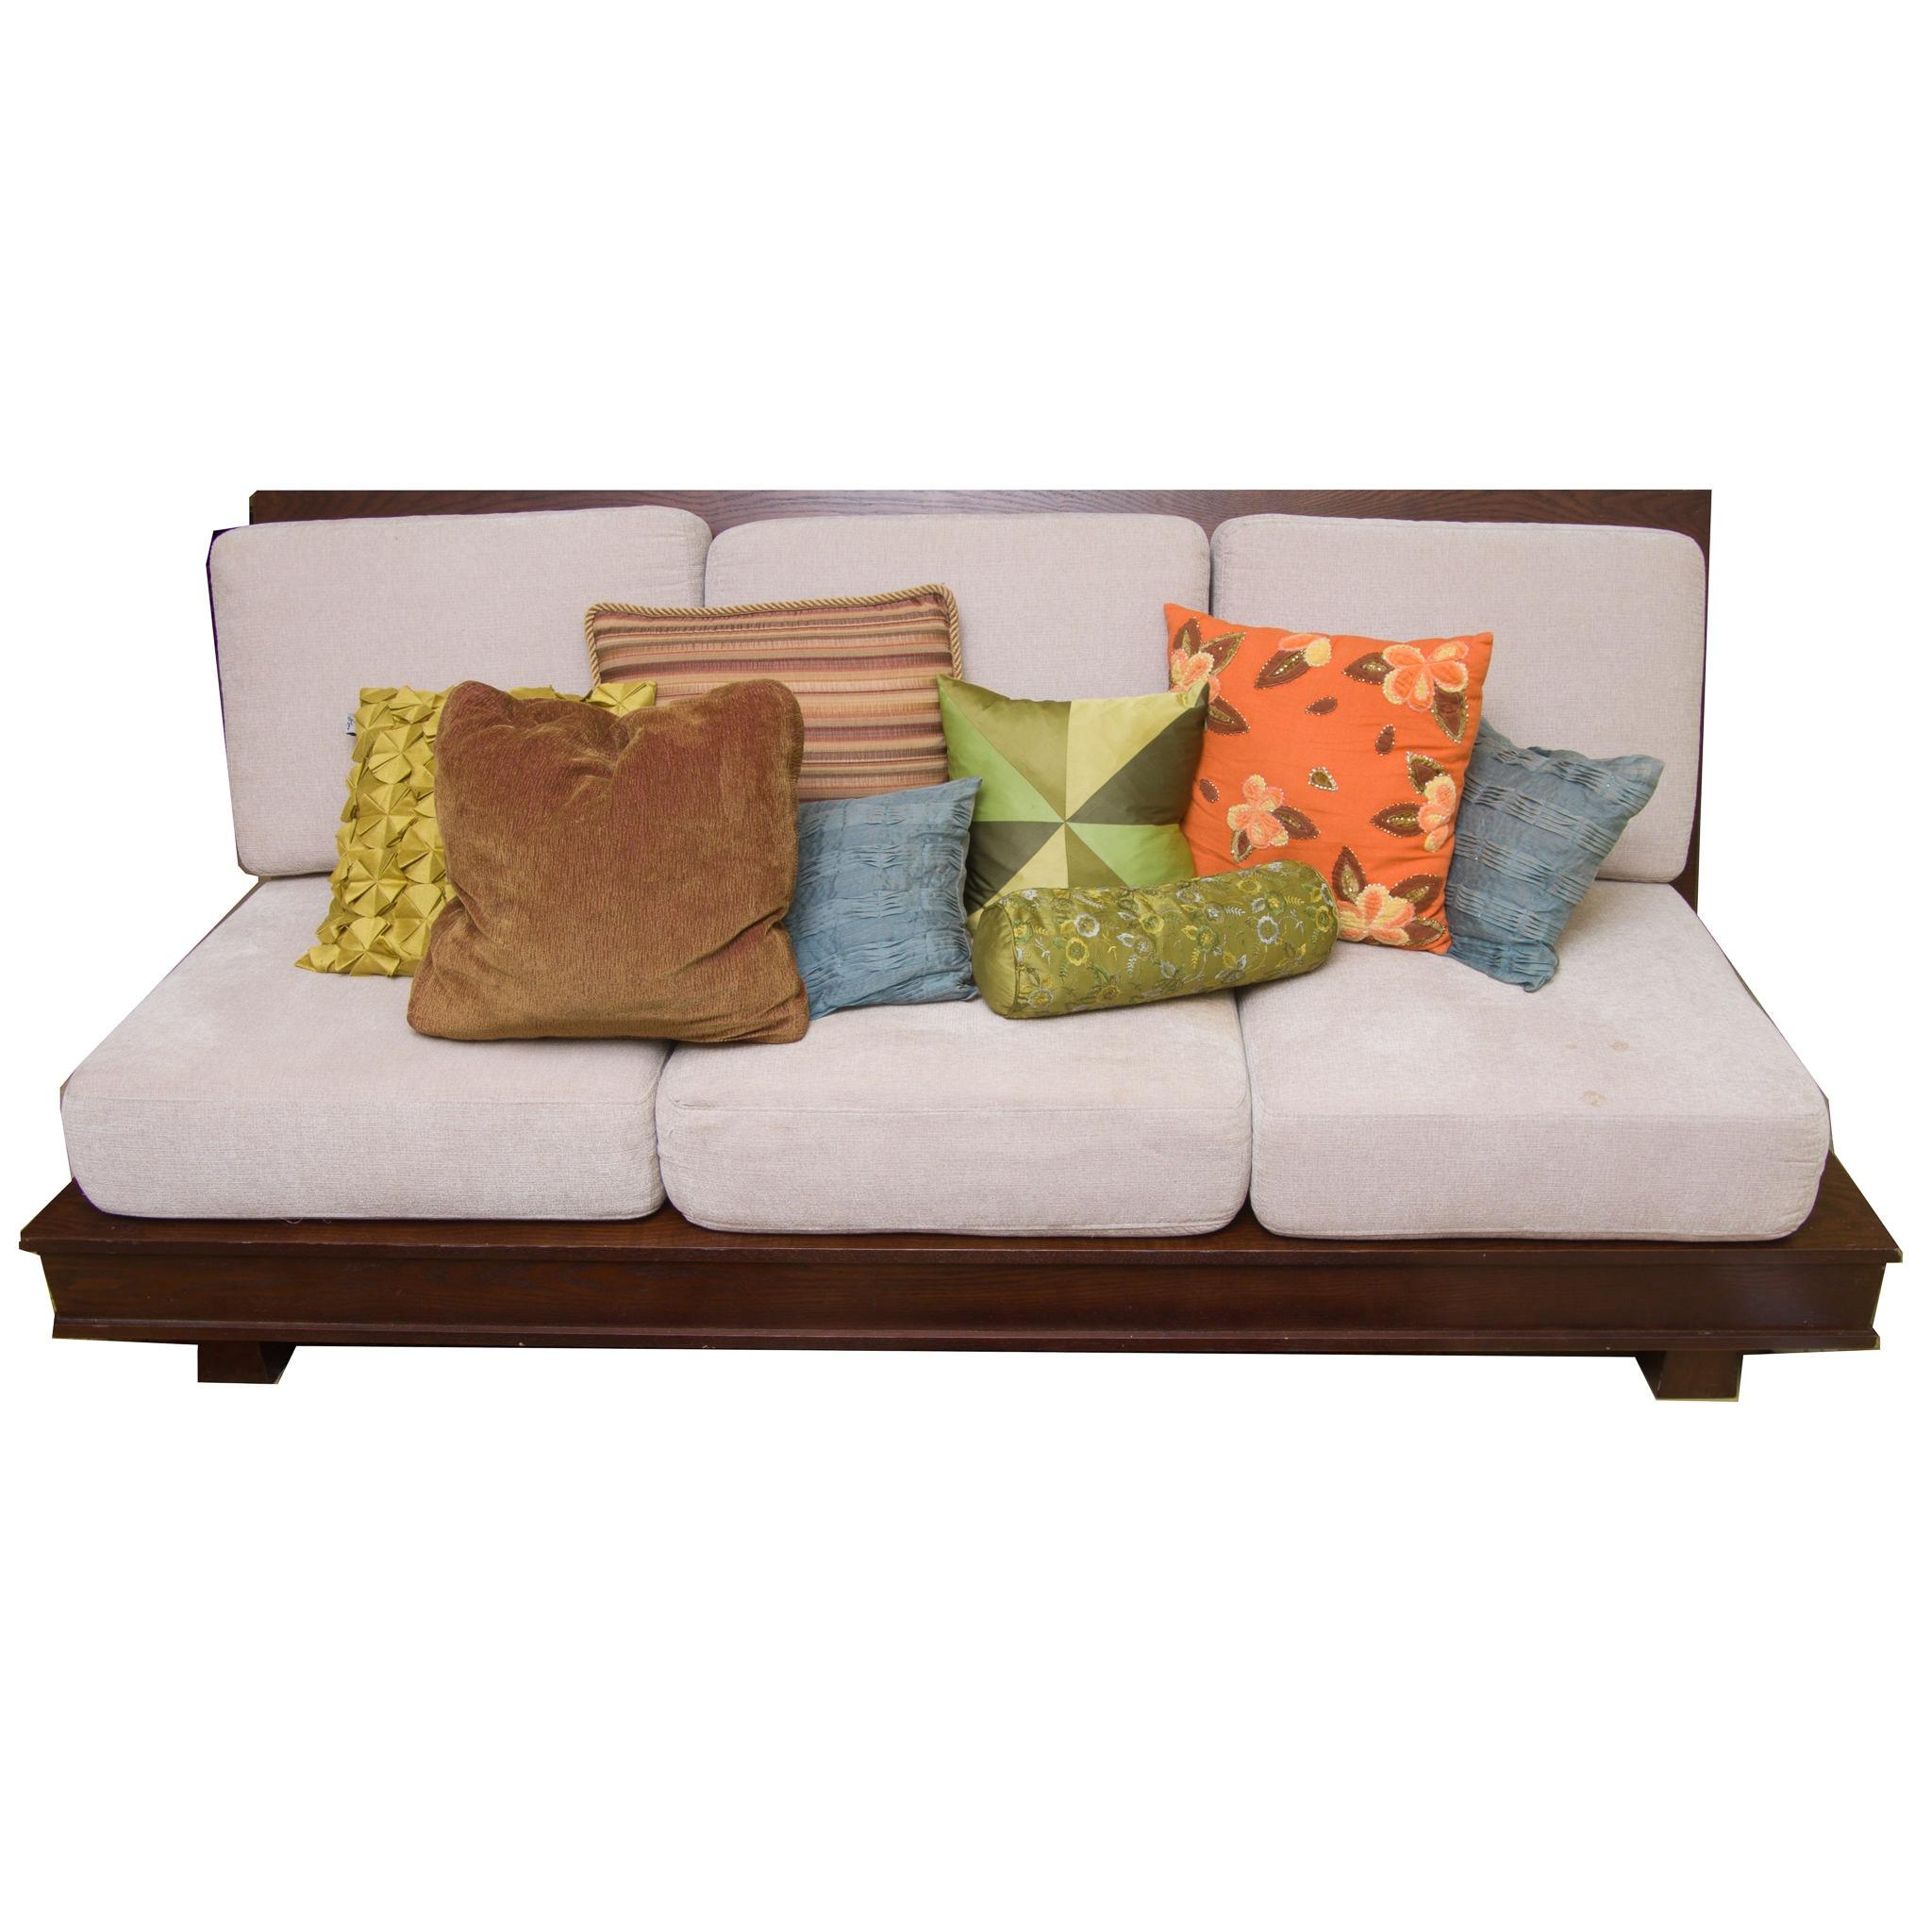 Oak Three Cushion Sofa With Storage